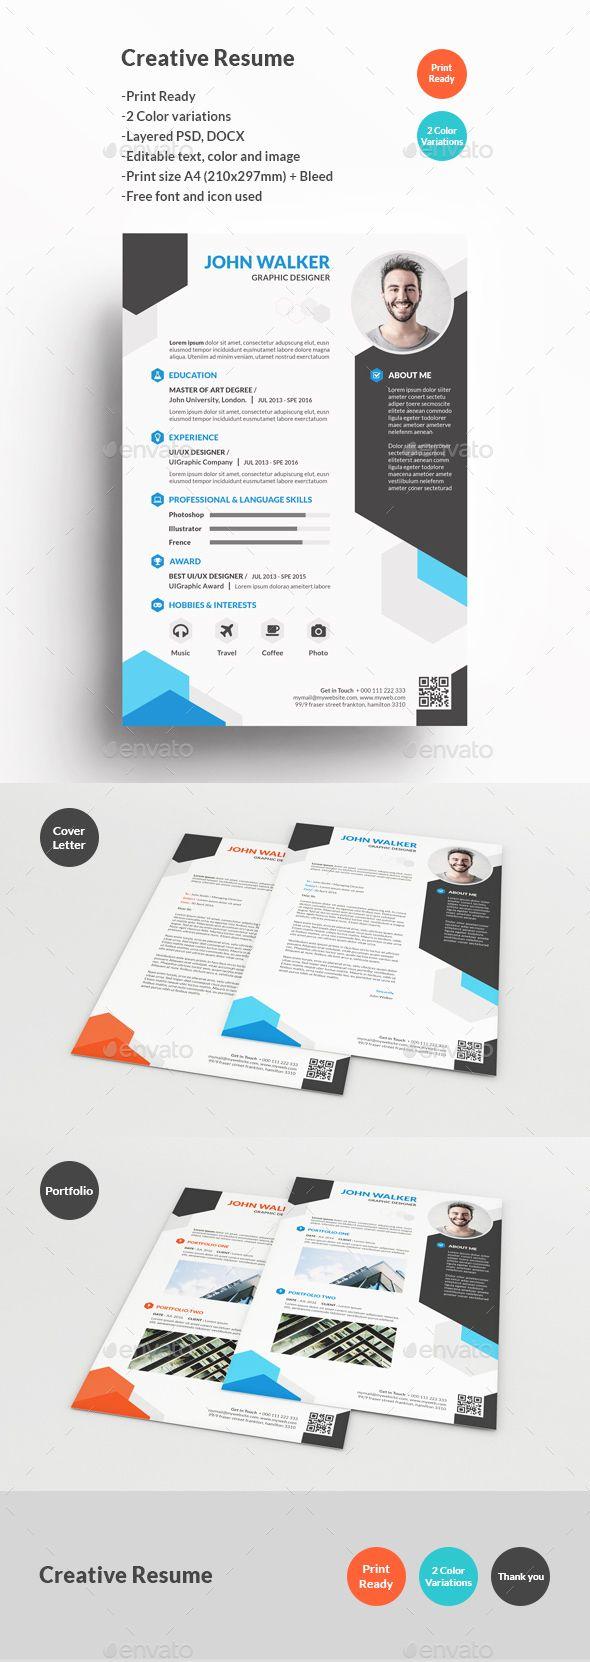 Creative Resume | Pinterest | Currículum, Curriculums y Plantilla cv